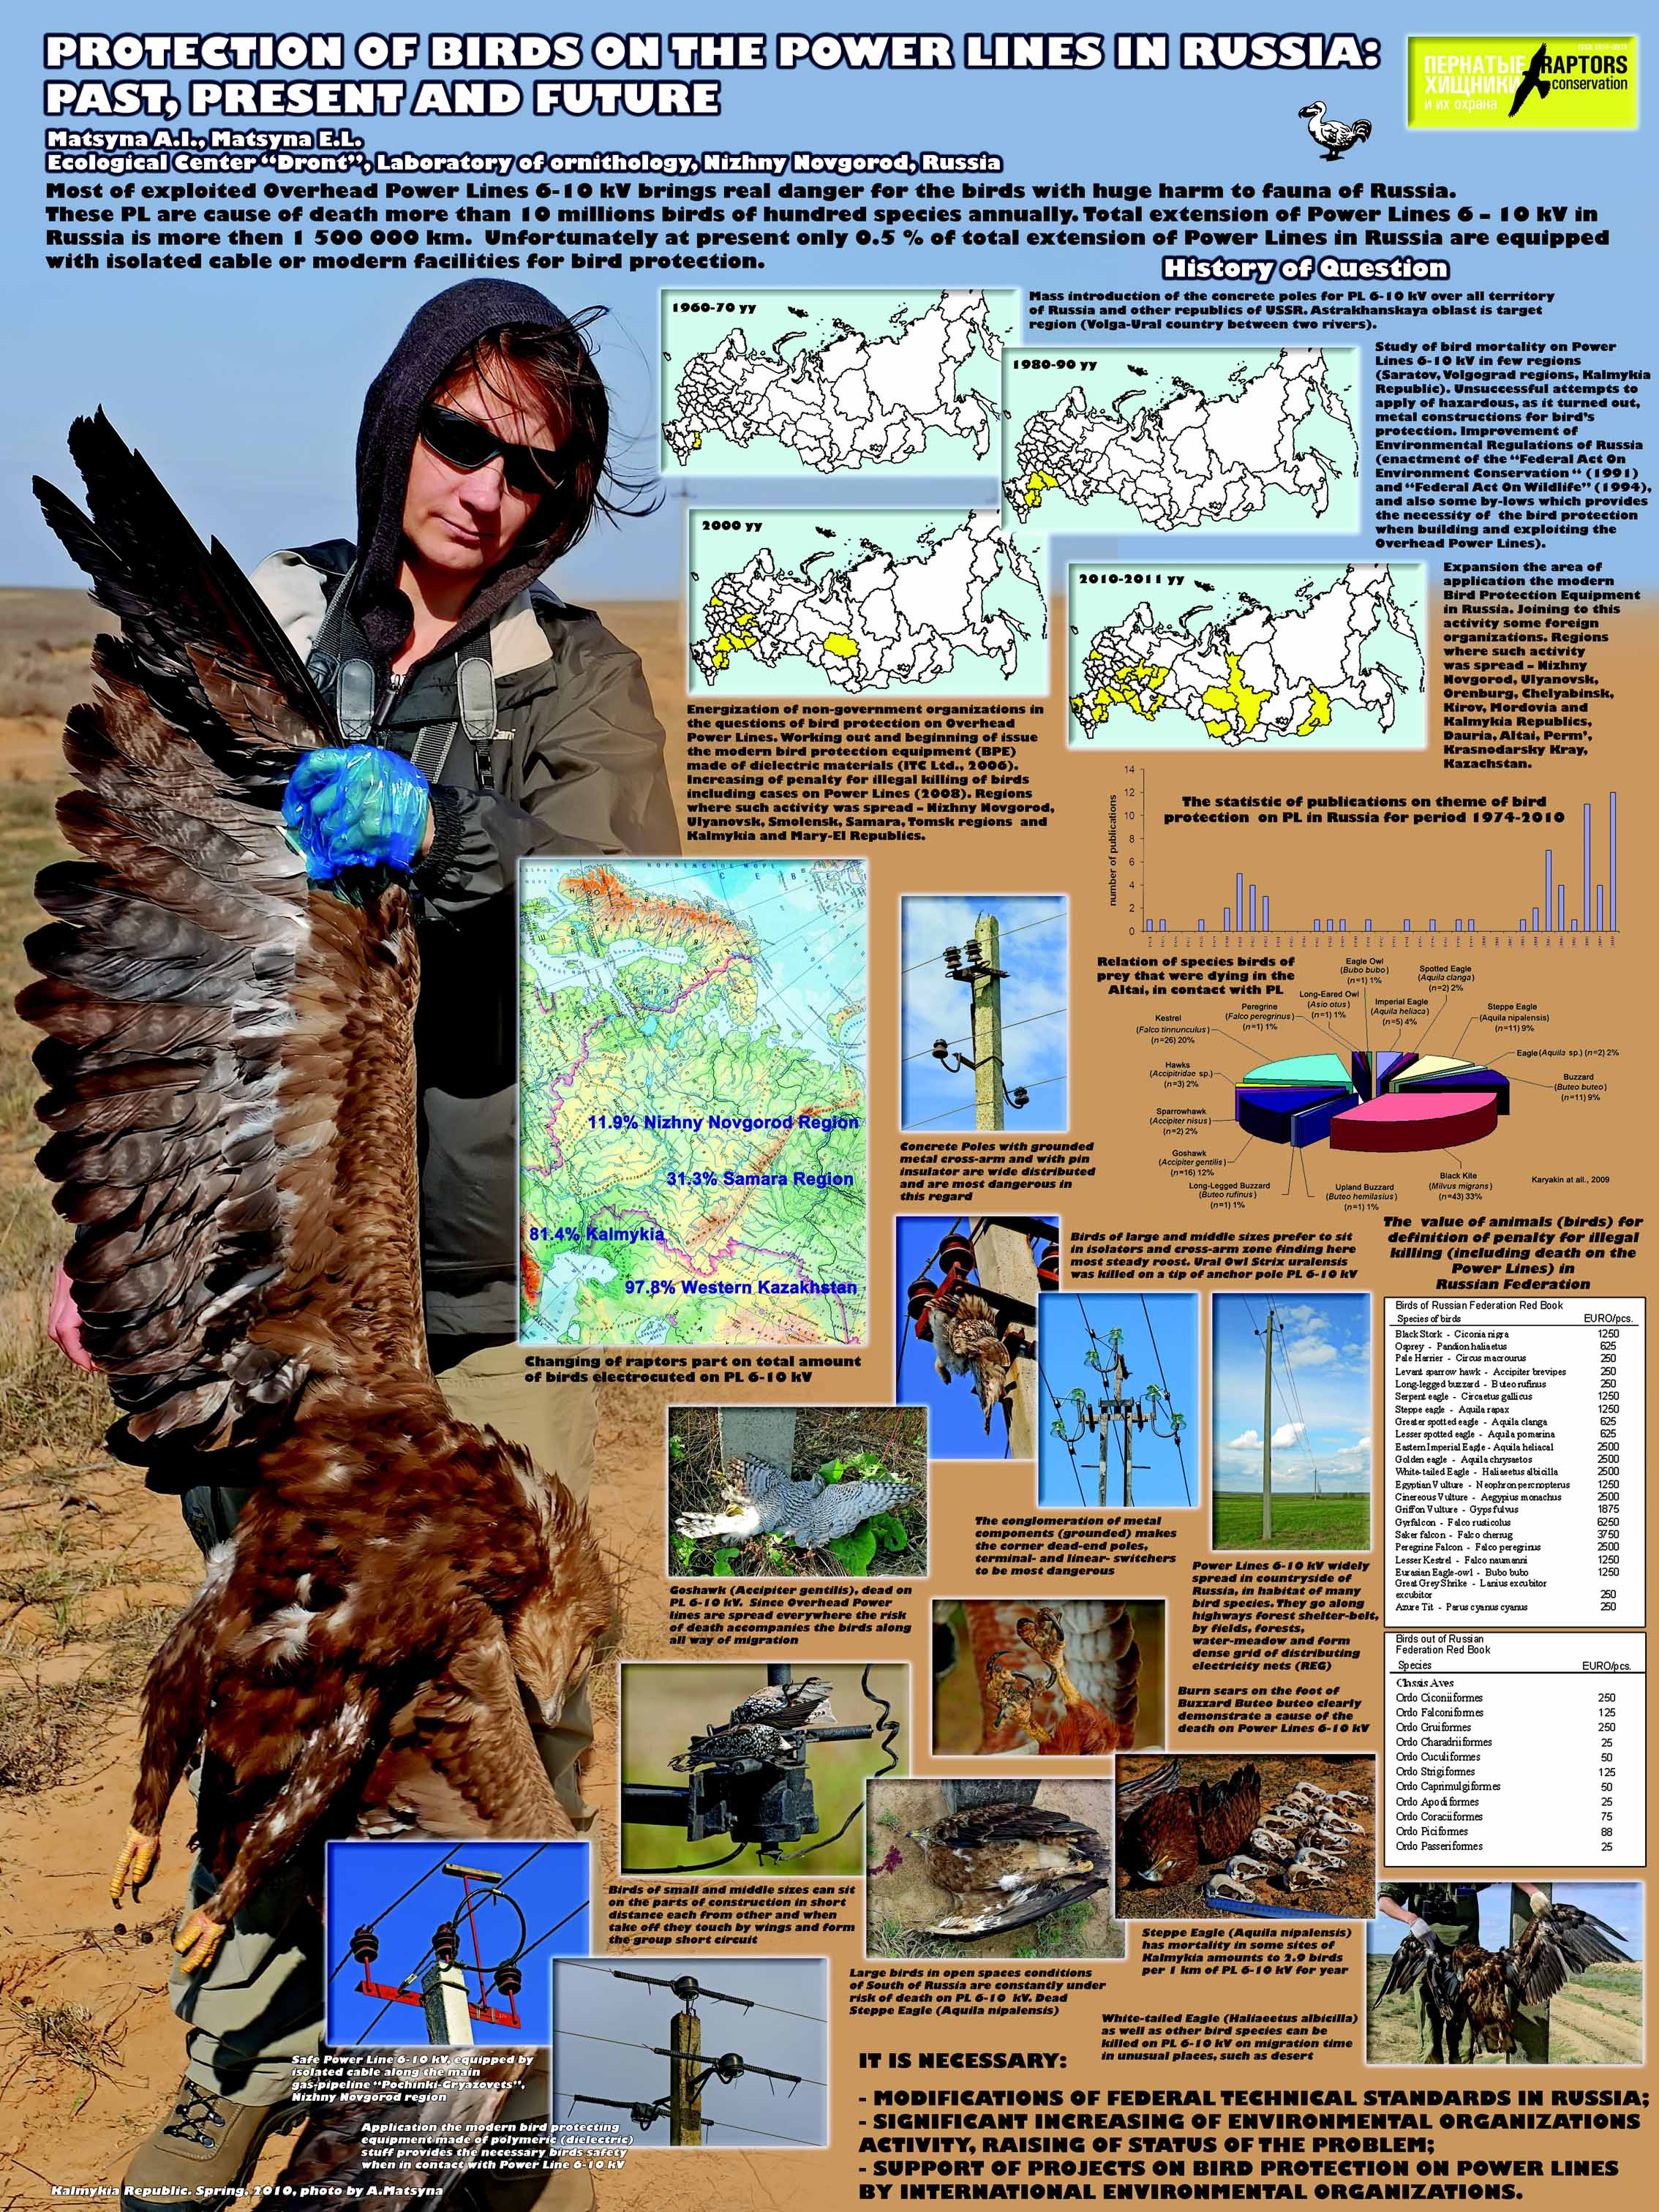 презентации о жизни птиц